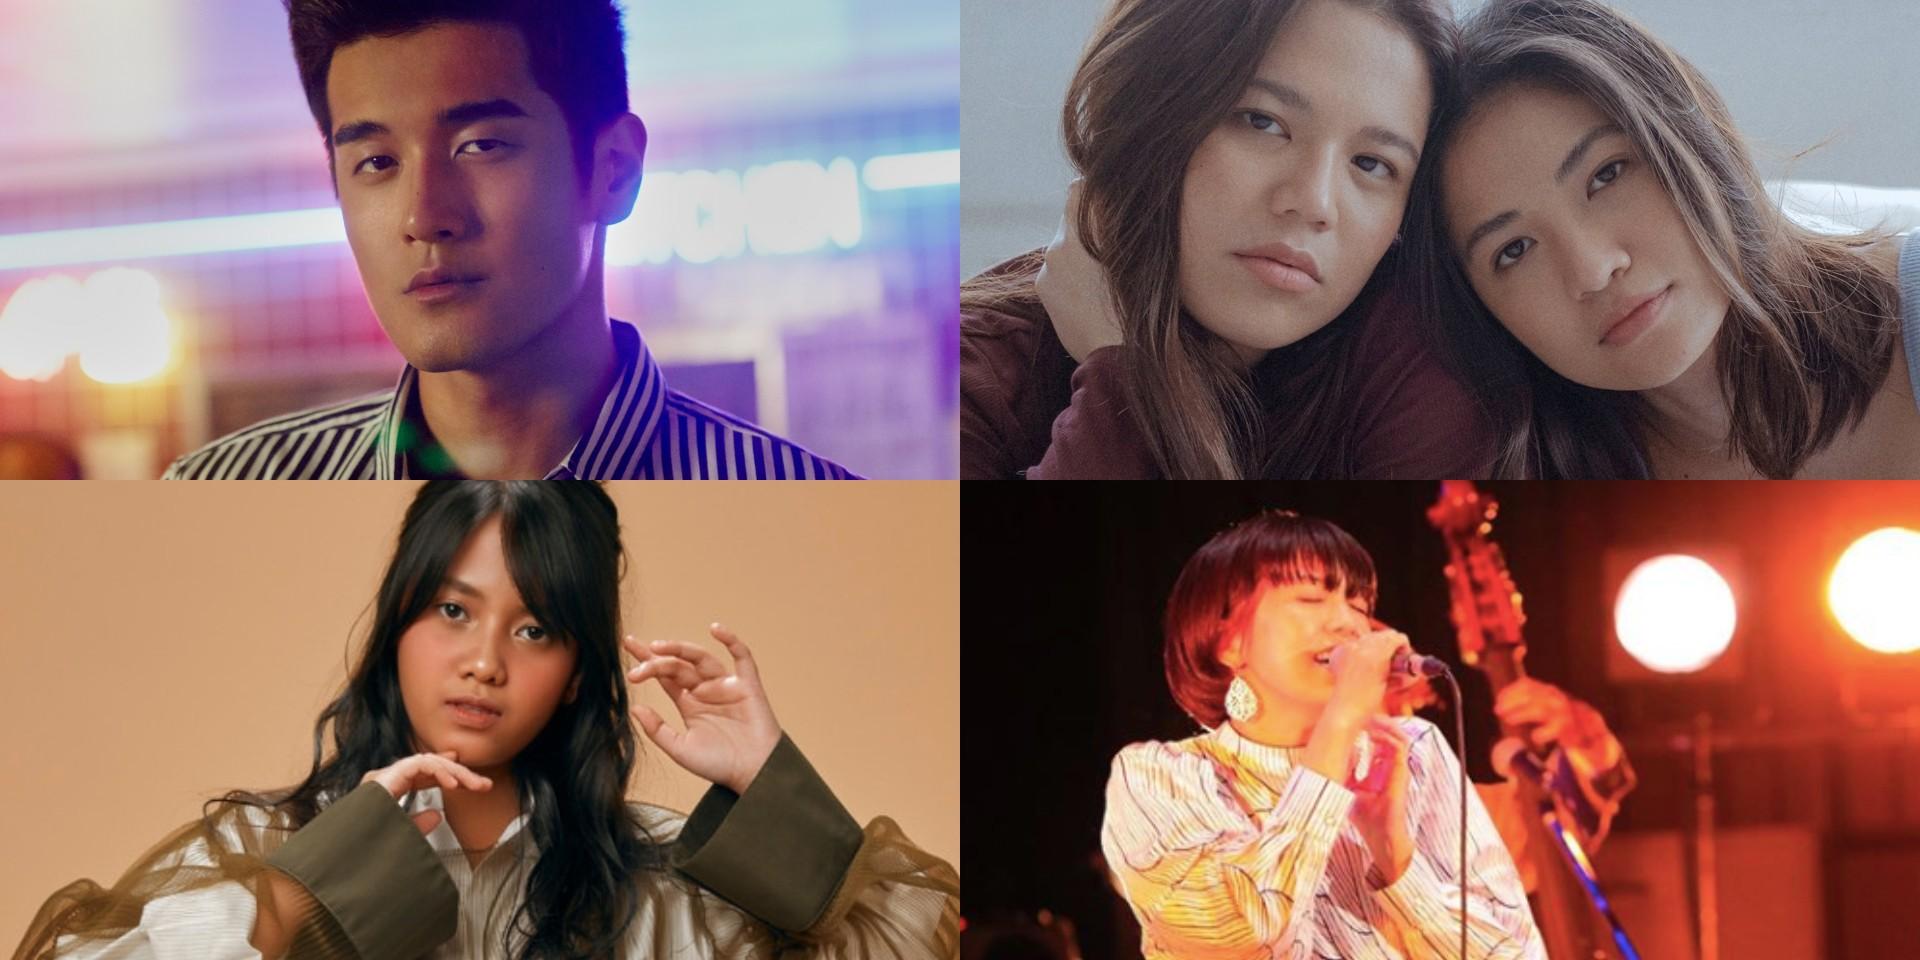 Nathan Hartono, Leanne & Naara, Hanin Dhiya, Anri Kumaki, and more band together to raise mental health awareness with Project Unsung